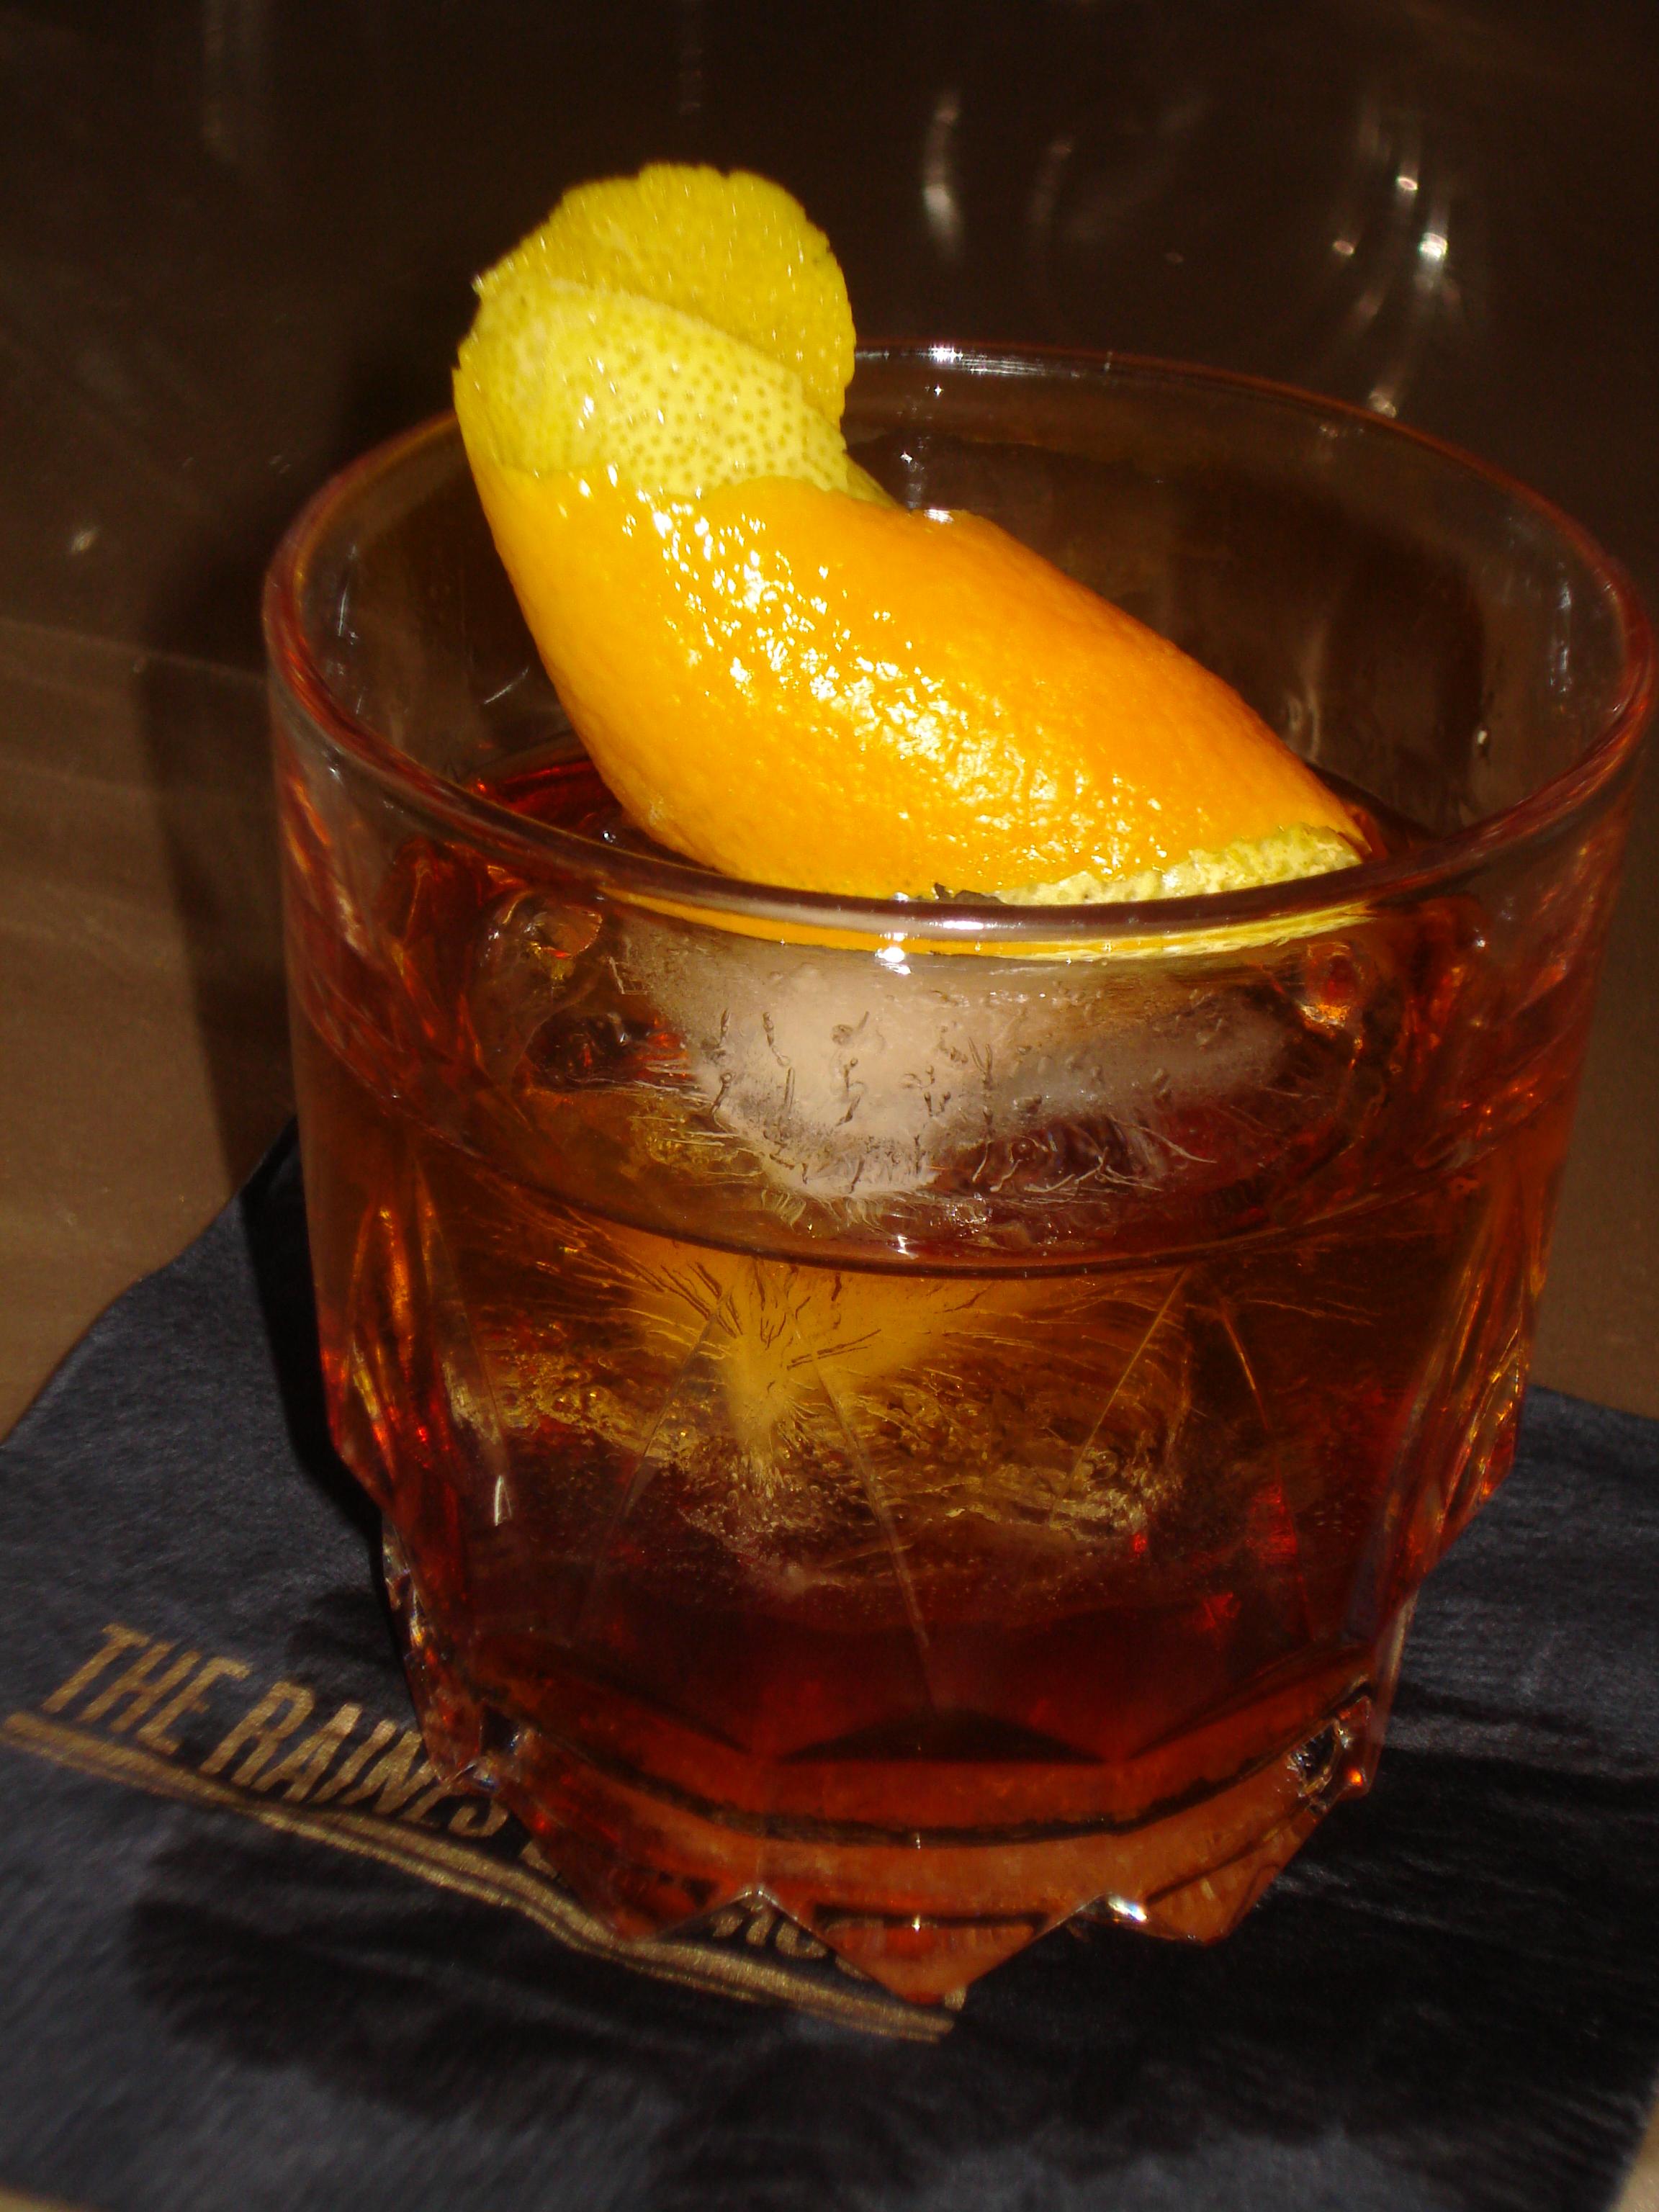 "Meaghan Dorman's ""Amber Old-Fashioned"" with Zacapa 23, Elijah Craig 18, angostura bitters, peach bitters, and demerara sugar cube."